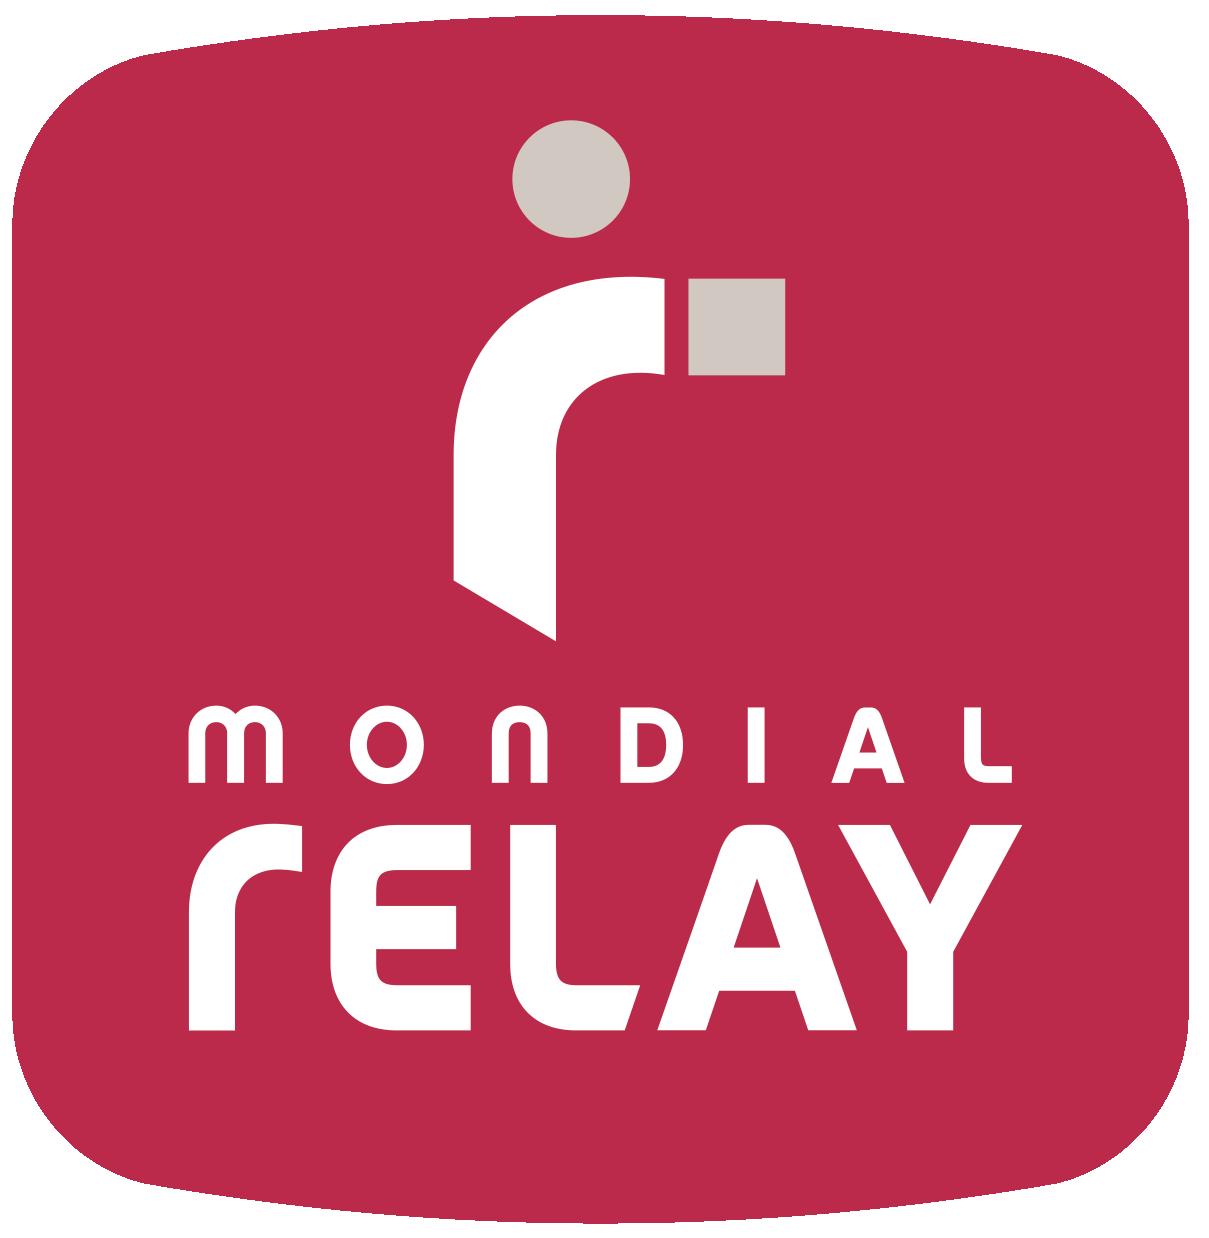 https://www.mondialrelay.fr/media/52539/logo_classique_mr.png